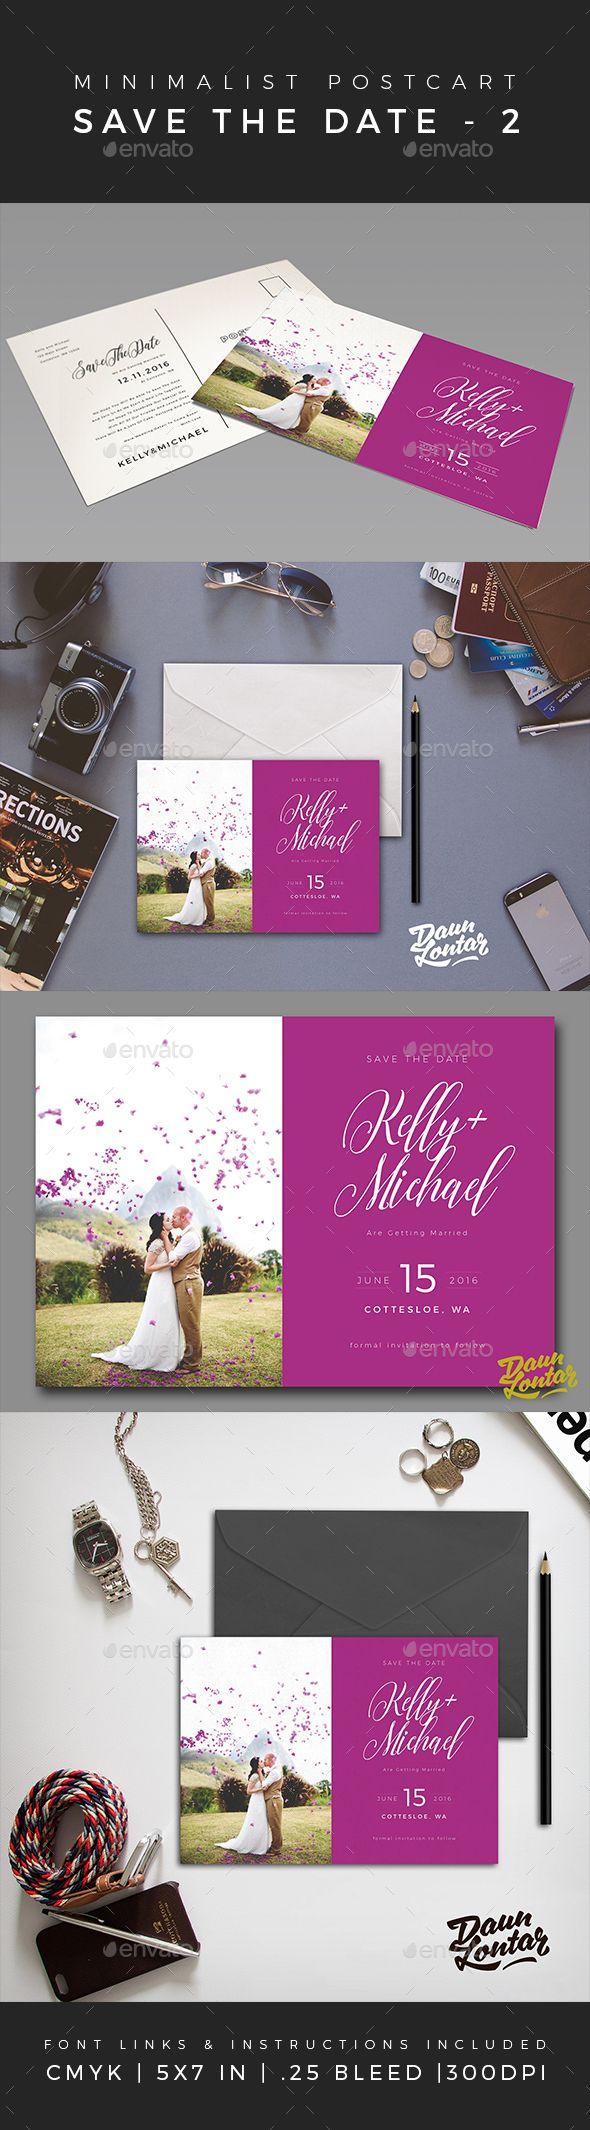 wedding invitation design psd%0A Minimalist Save The Date Postcard Design Template Volume    Weddings Cards   u     Invites Template PSD